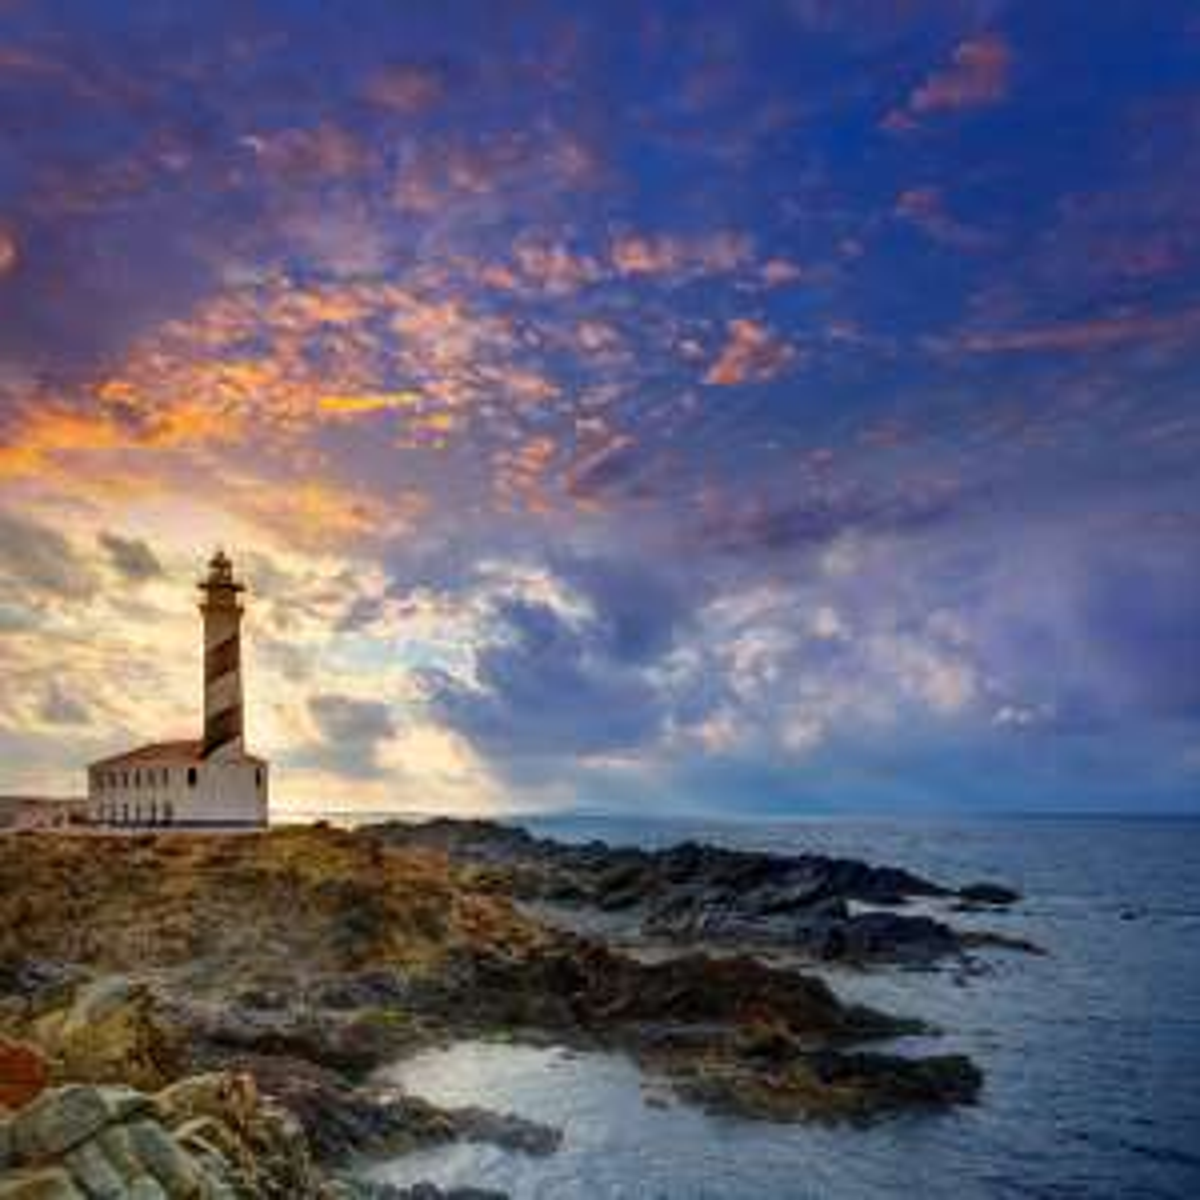 Flüge: Menorca [August] - Last-Minute - Hin- und Rückflug von Hannover nach Menorca ab nur 74€ inkl. Gepäck